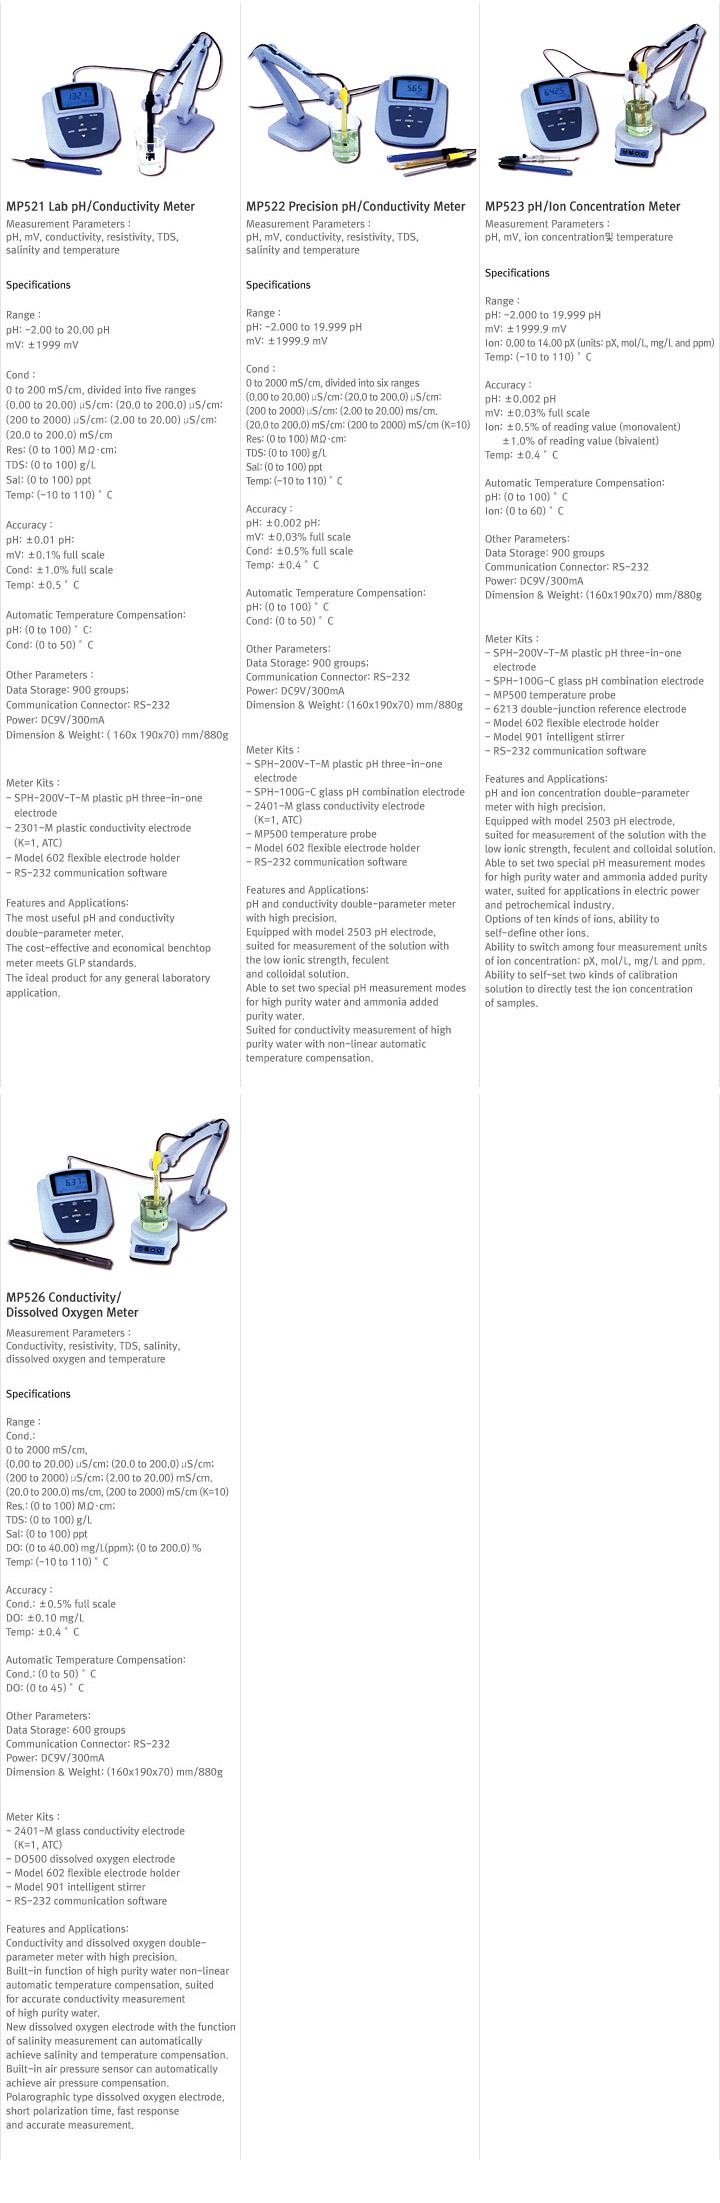 SAMSANKOREA Portable / Bench Type for Lab. Meters  1